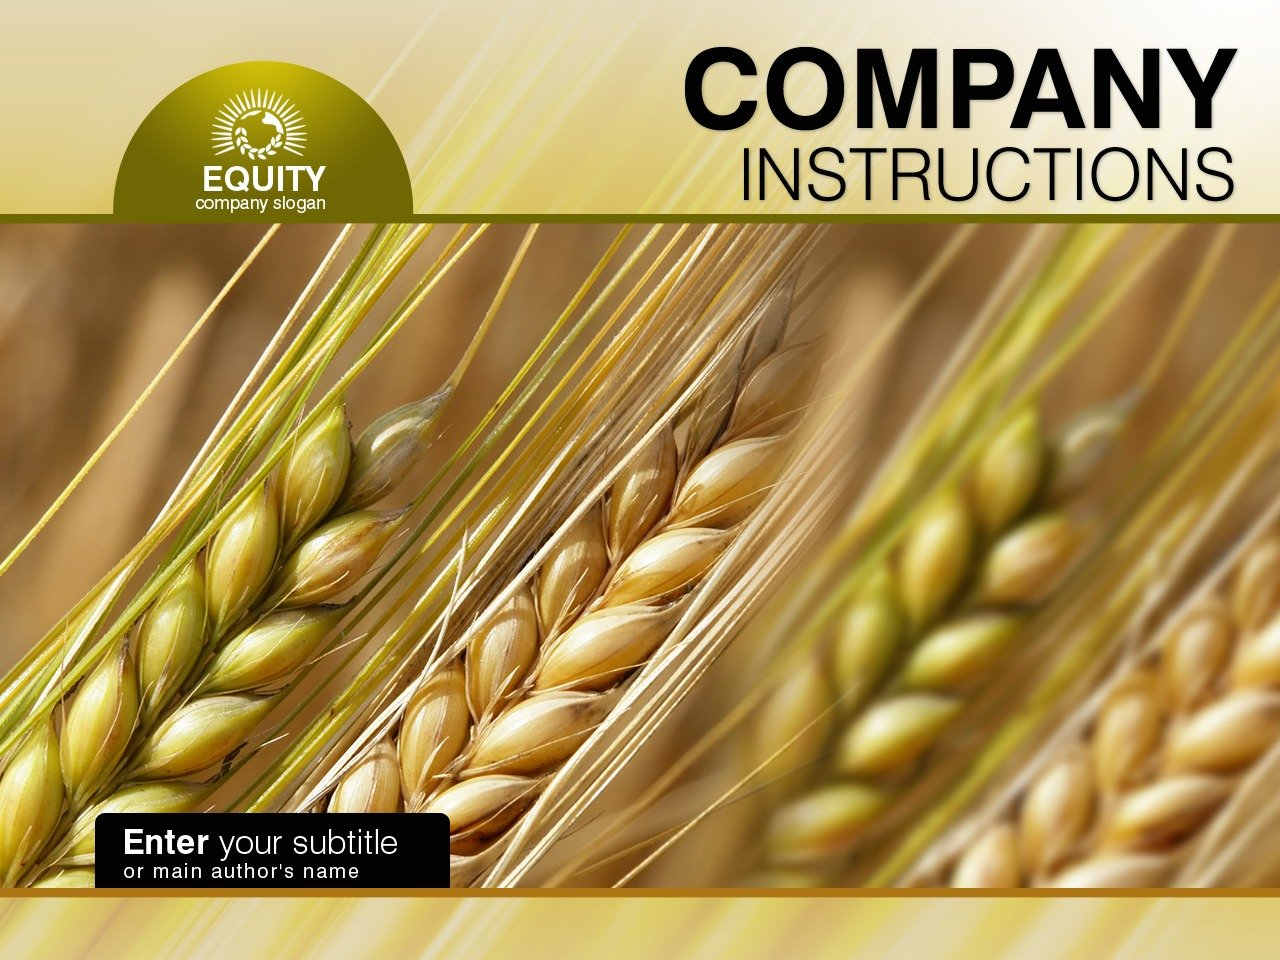 PowerPoint шаблон №34175 на тему сельское хозяйство